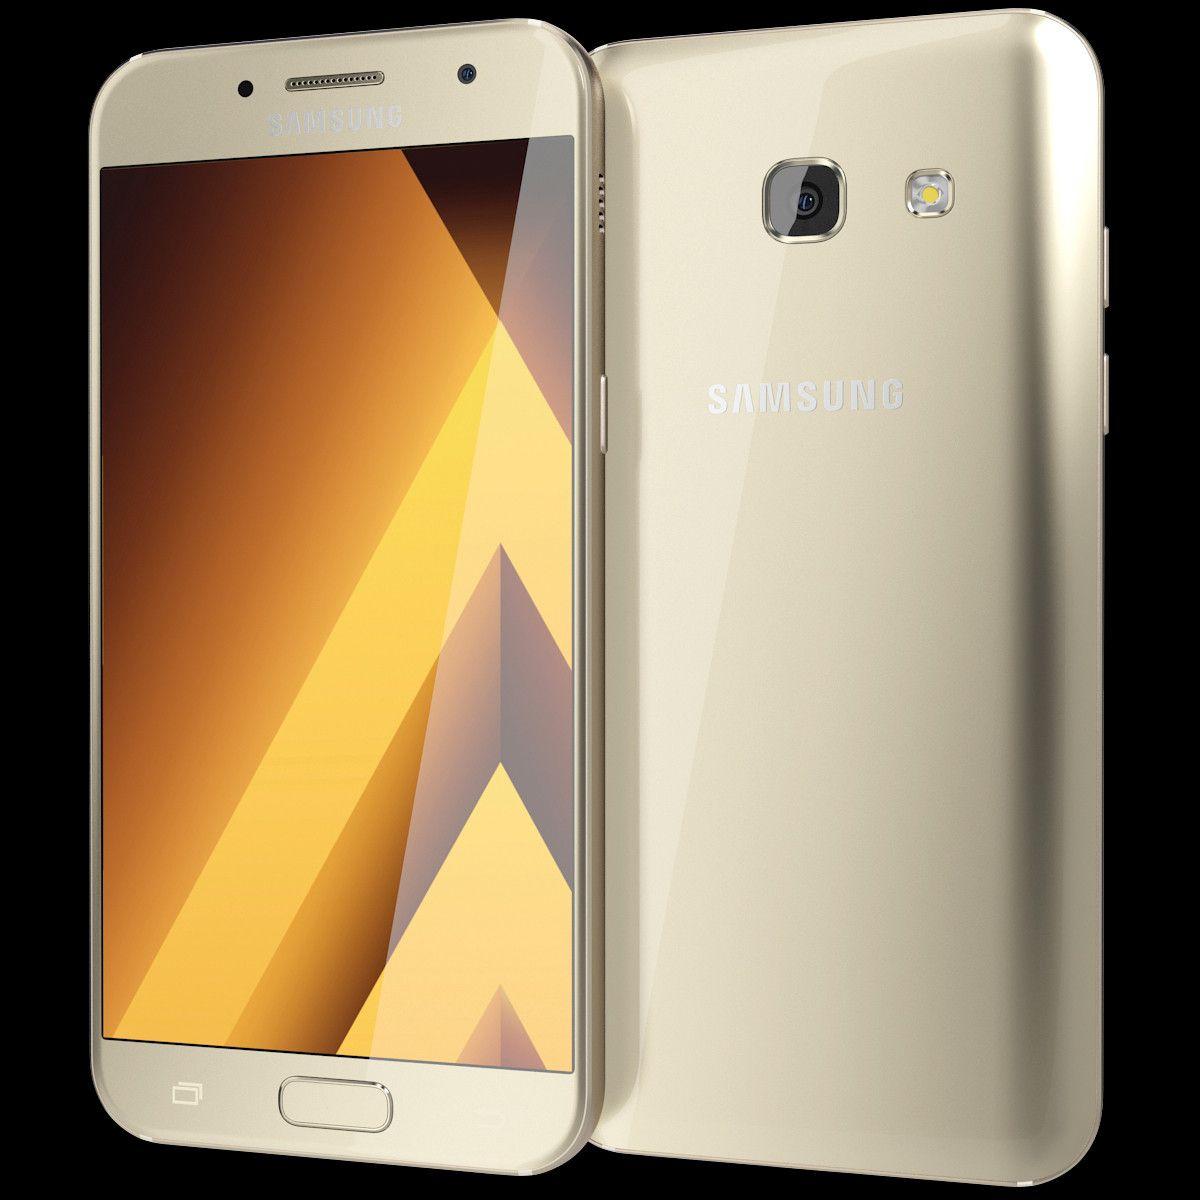 3d Realistic Samsung Galaxy A5 Model Modeling J120 2016 8gb White